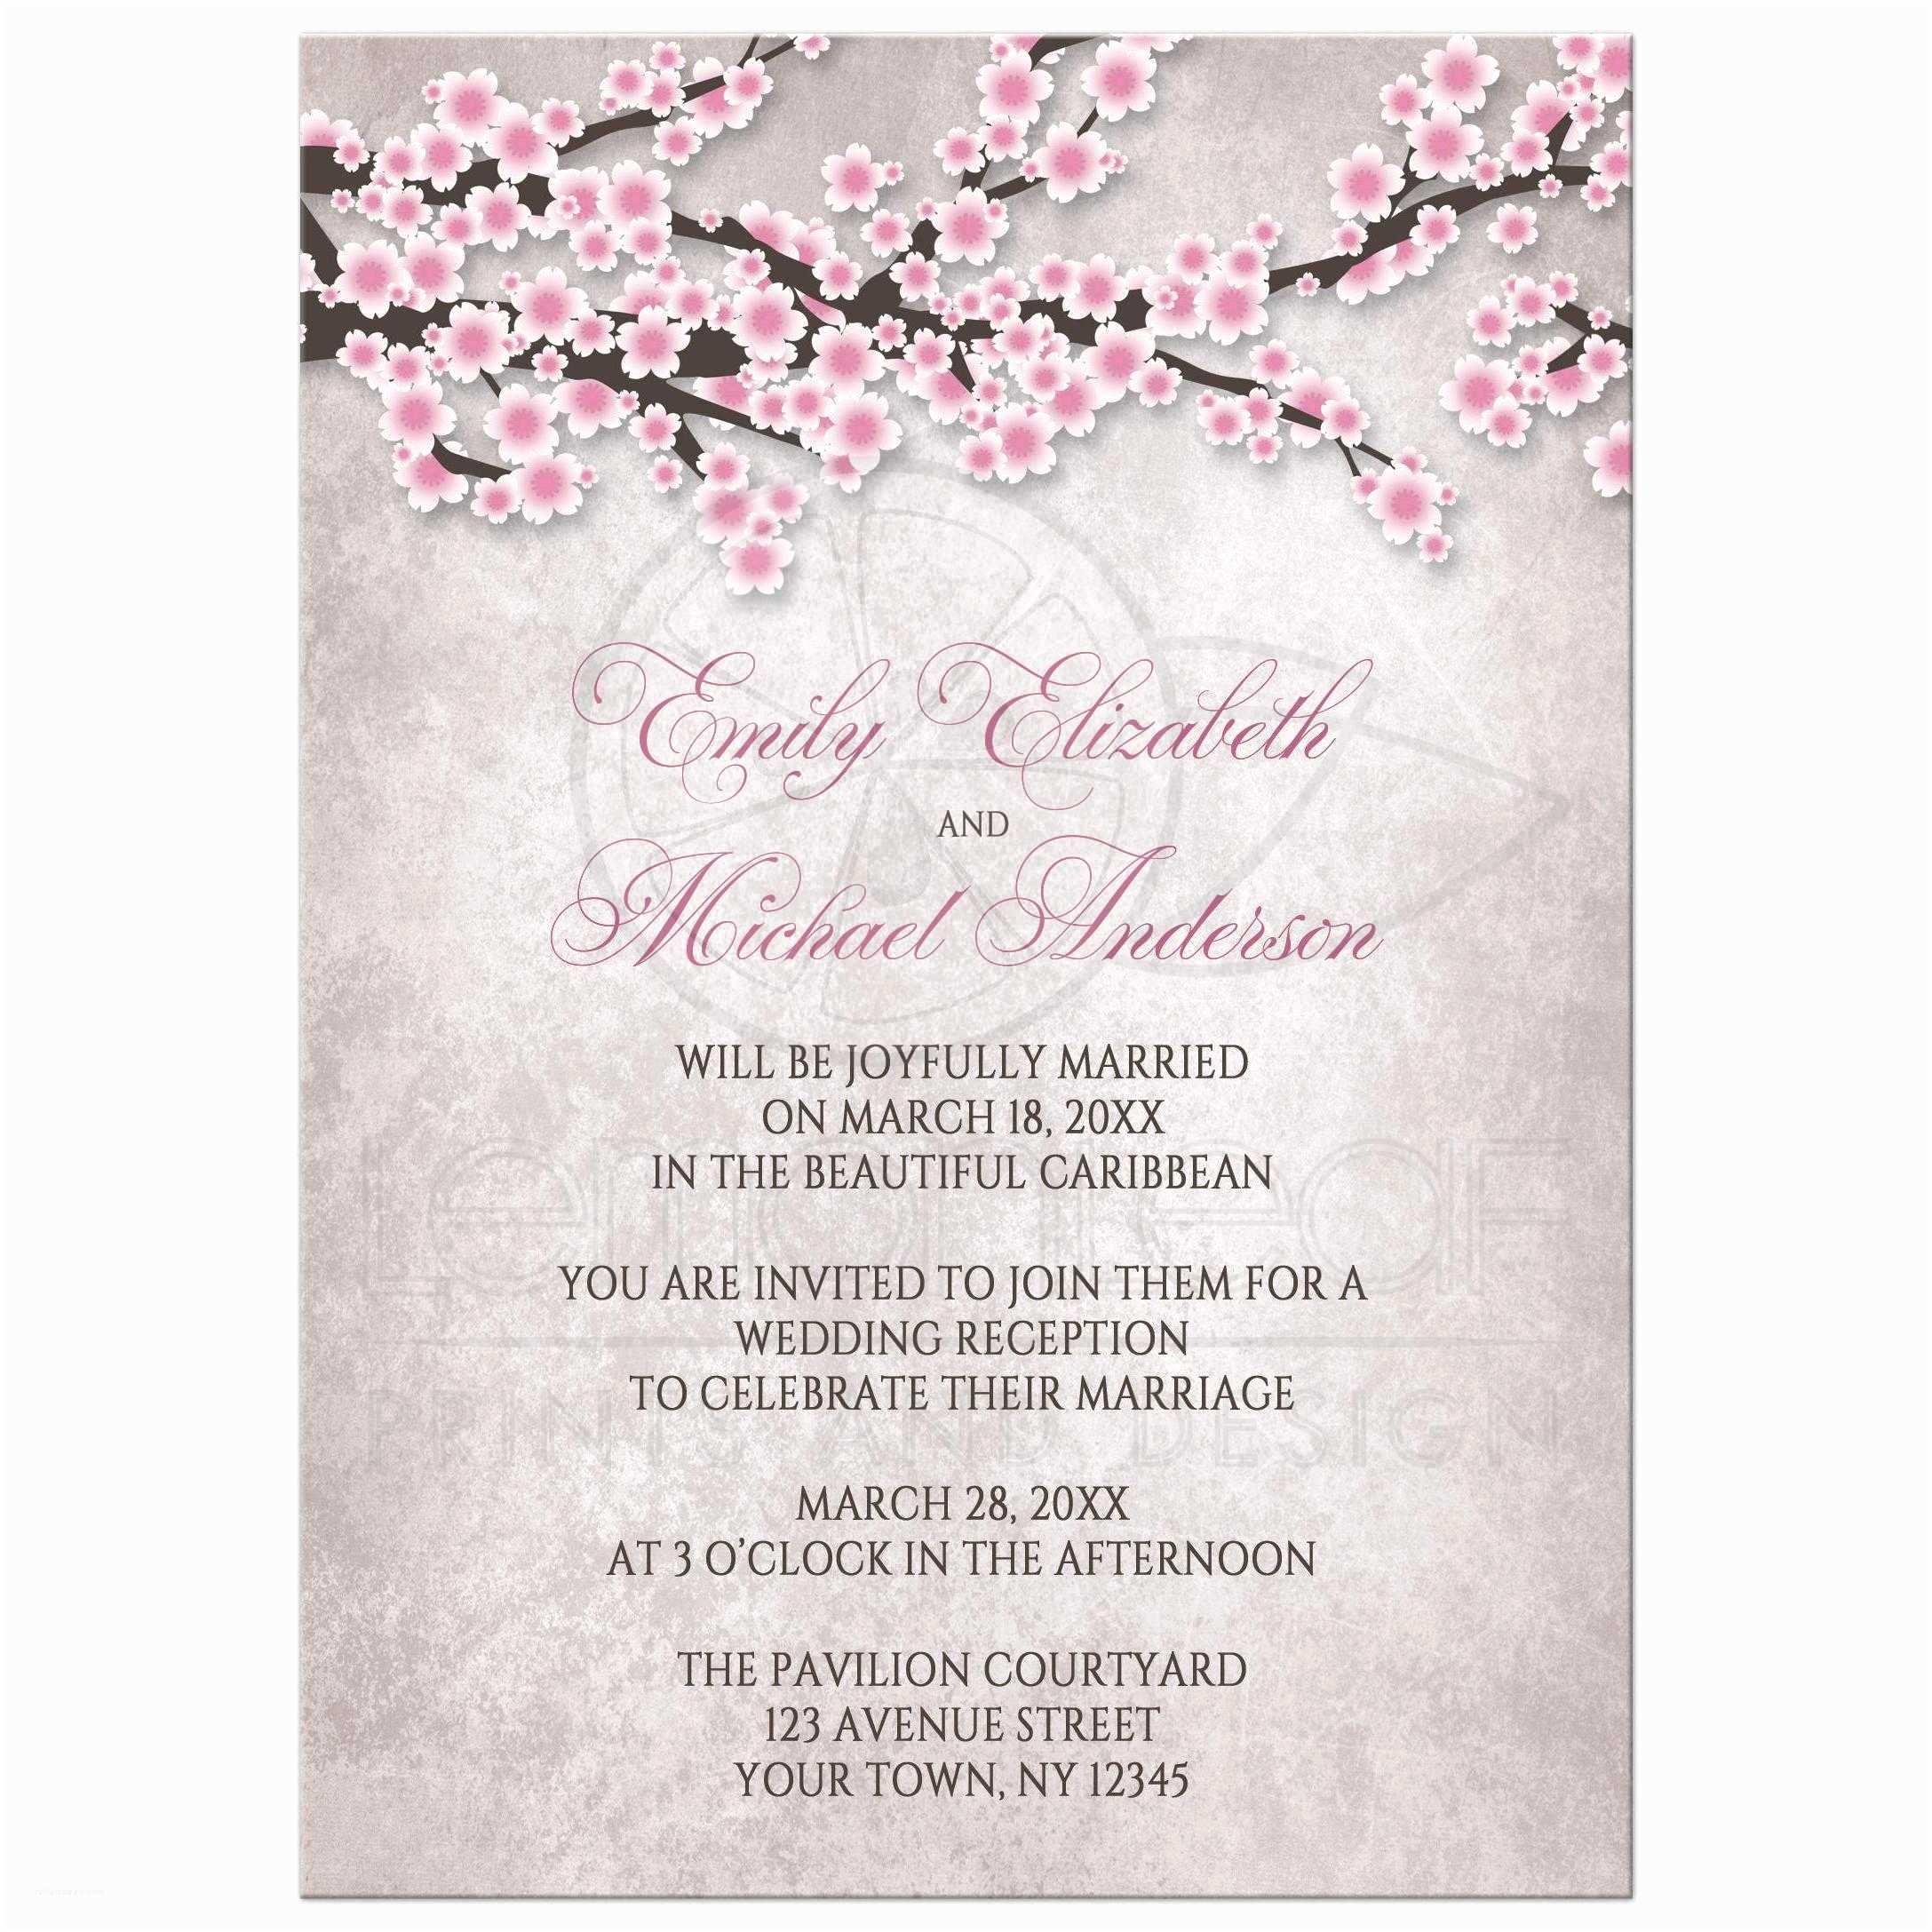 Cherry Blossom Wedding Invitations Reception Ly Invitations Rustic Pink Cherry Blossom